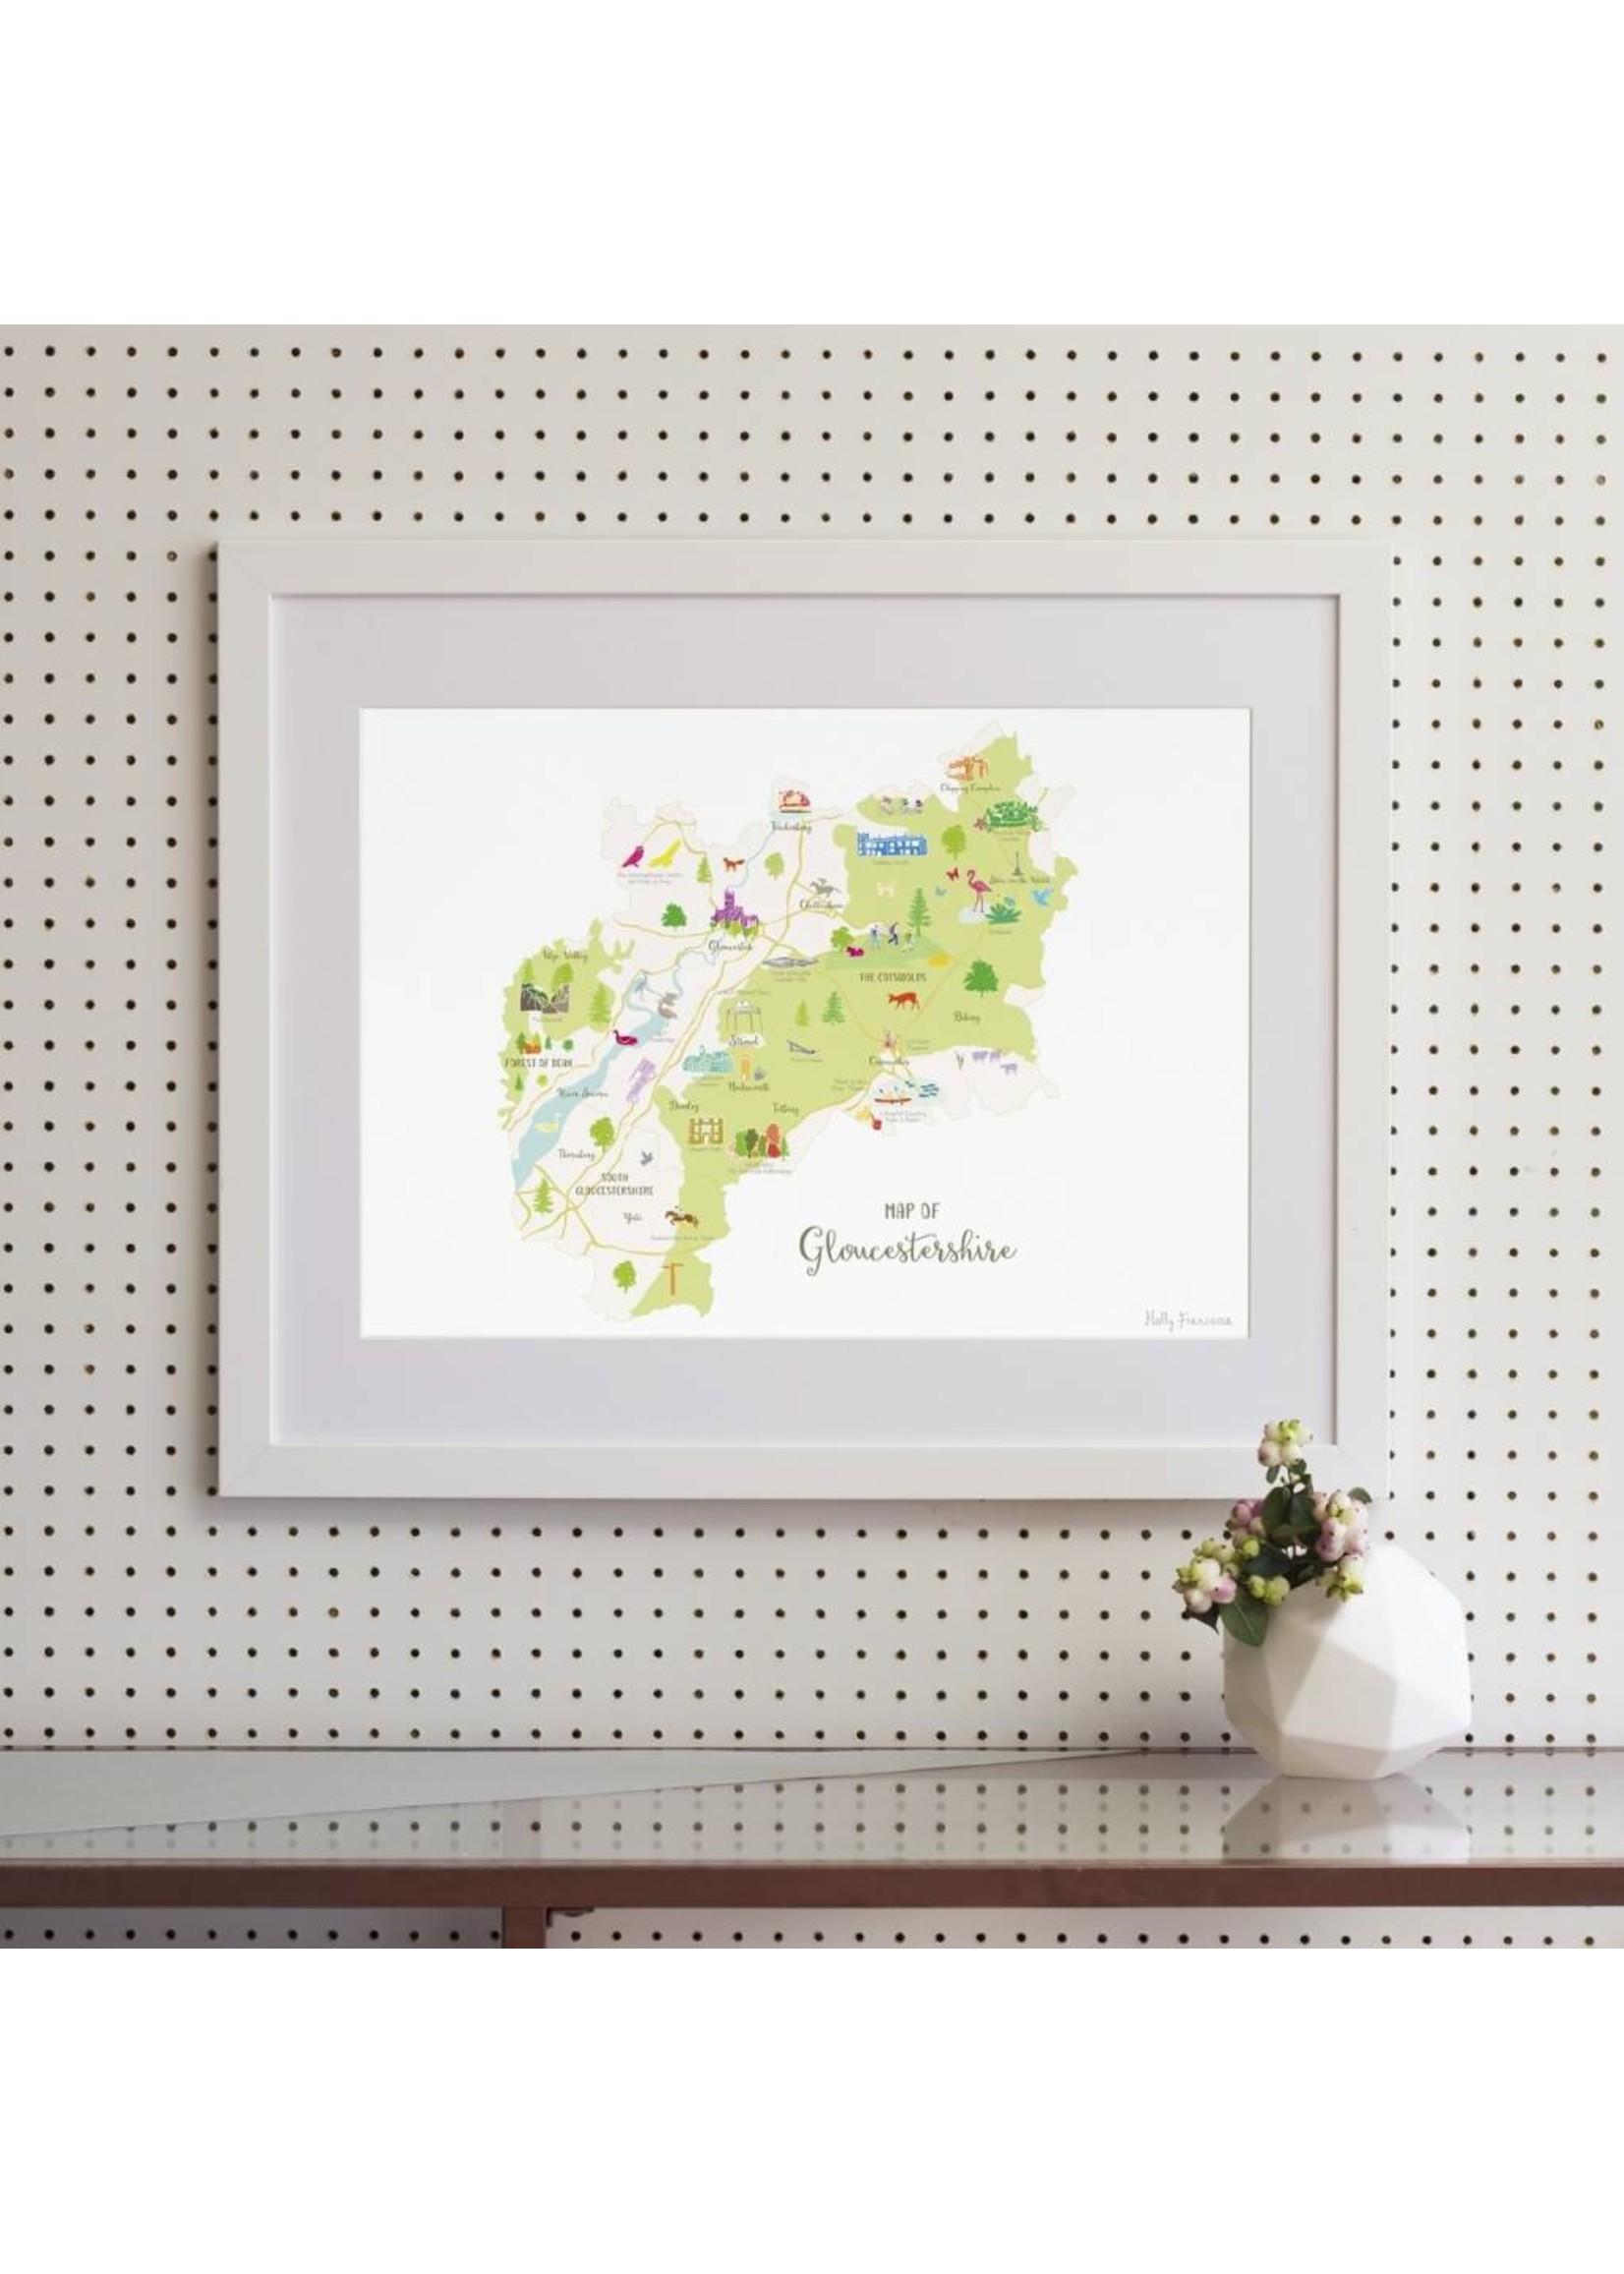 Holly Francesca Holly Francesca Map of Gloucestershire A4